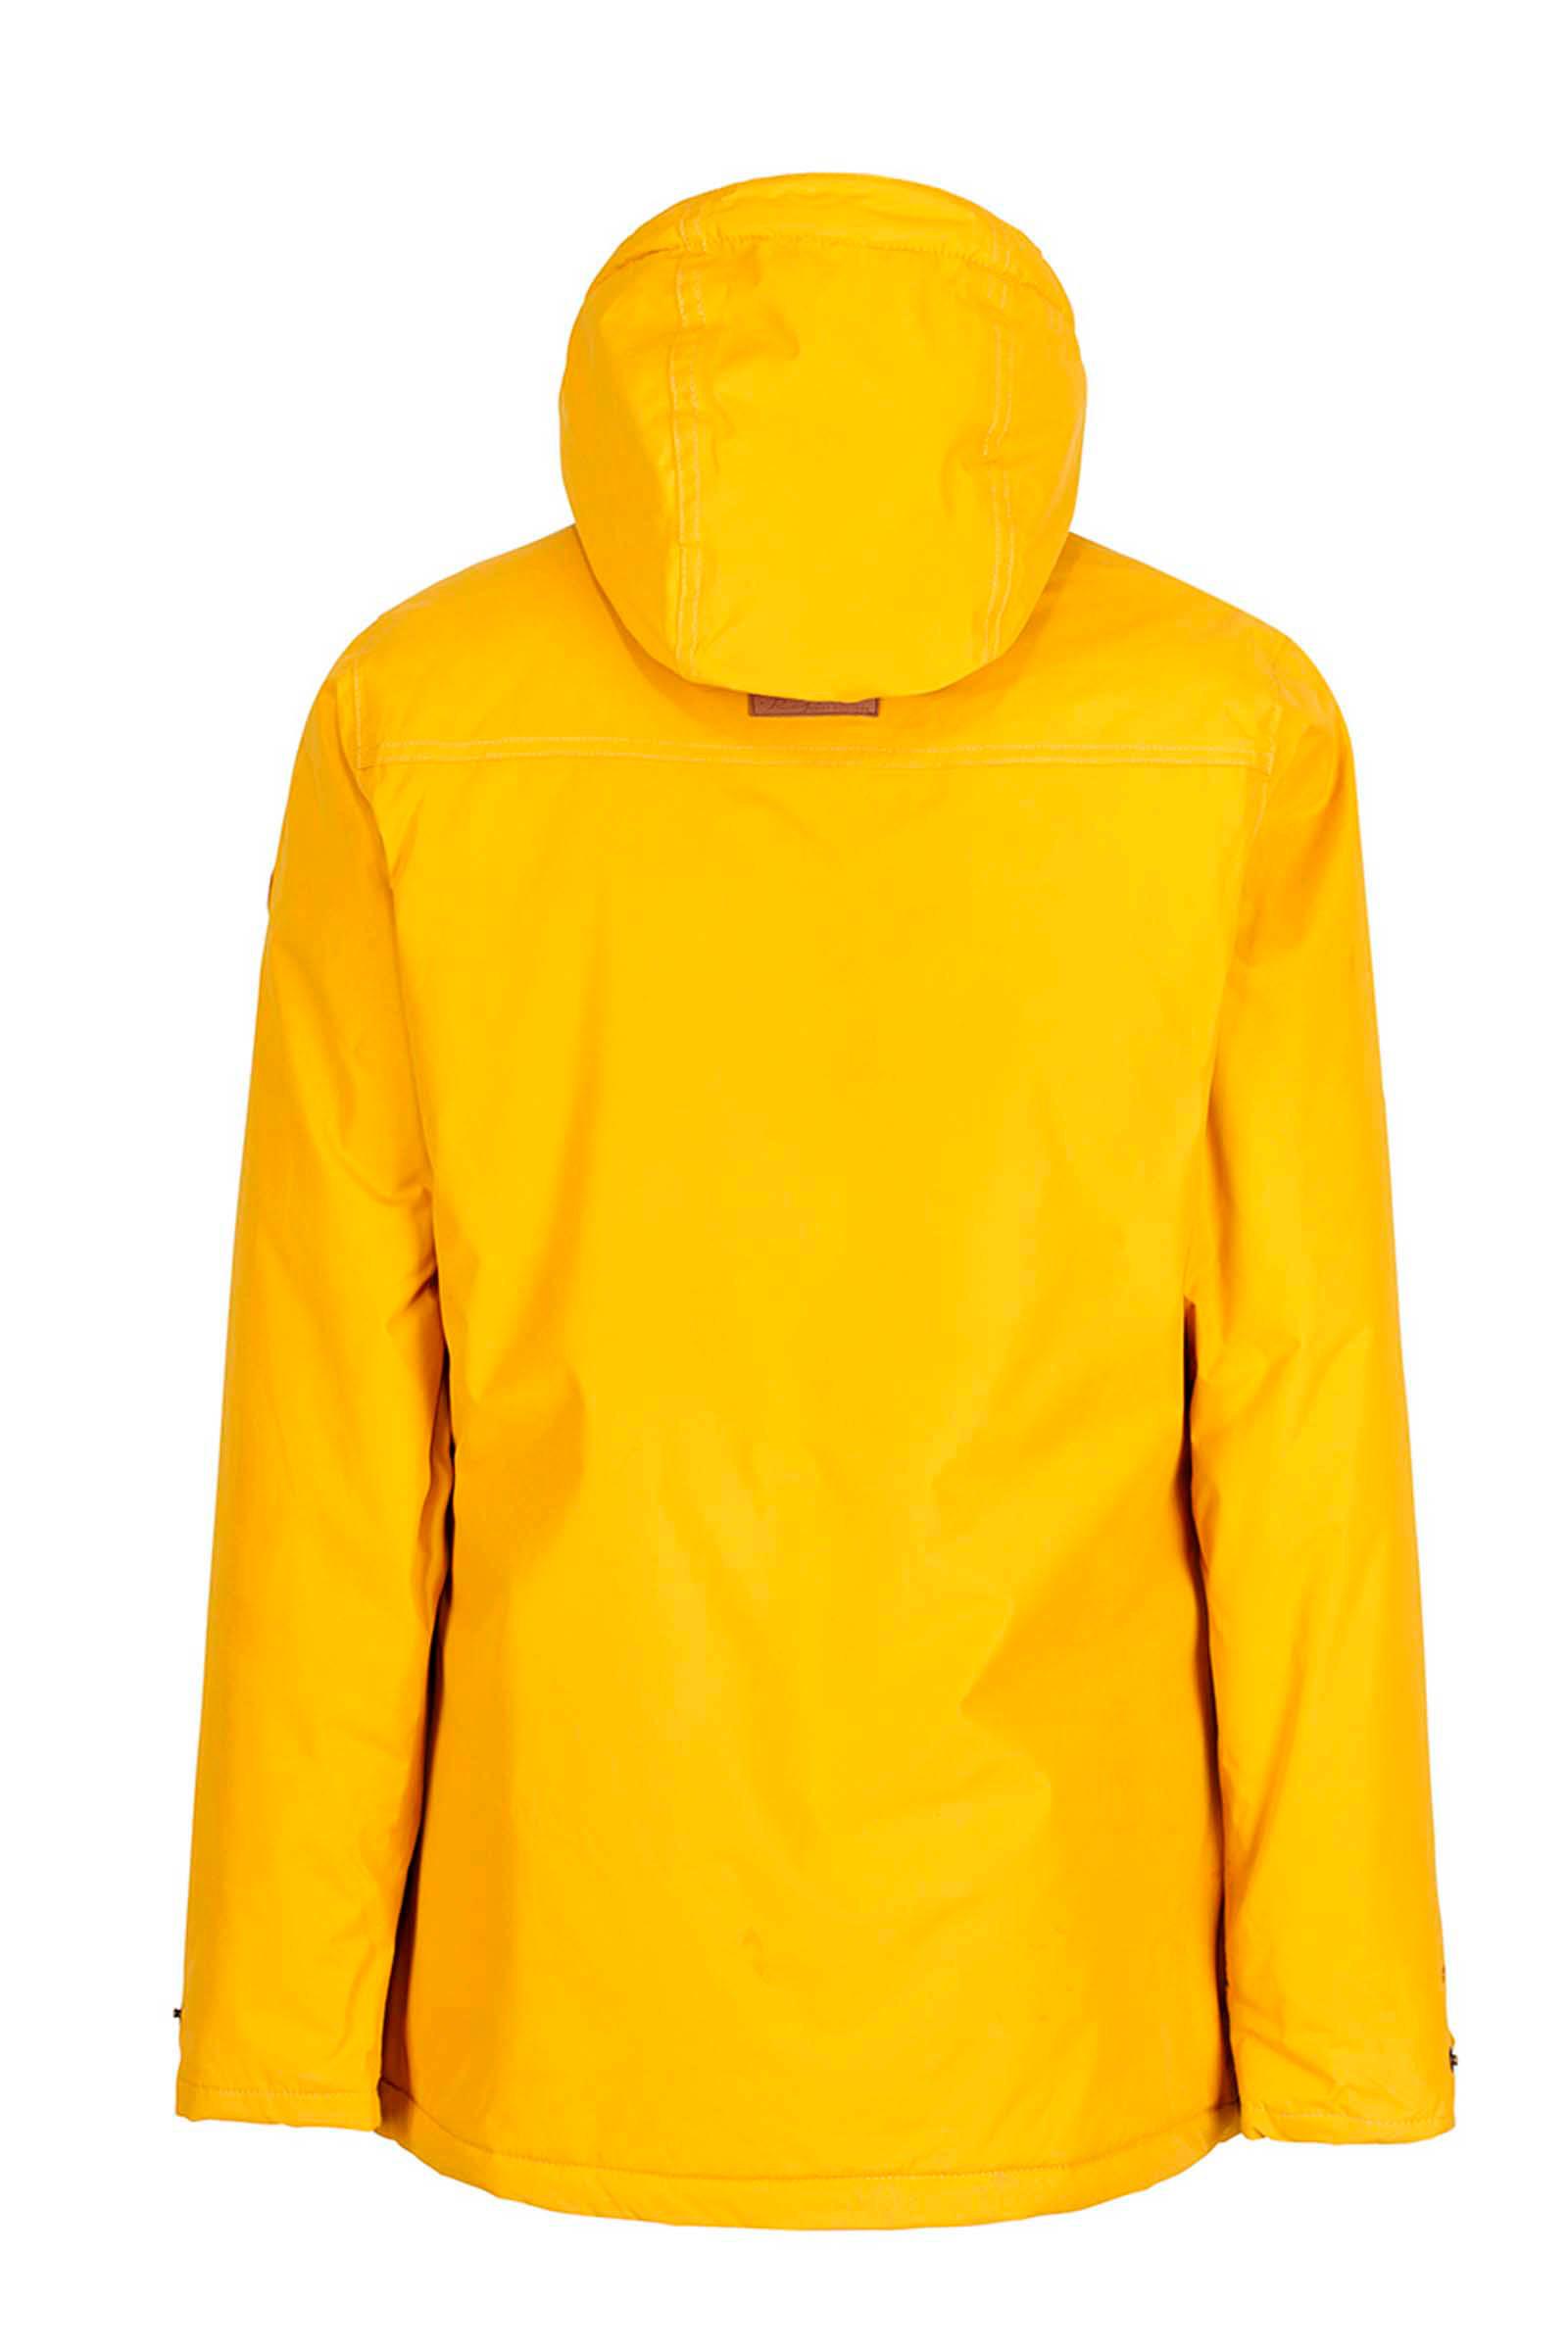 Regatta jas Bergonia geel | wehkamp